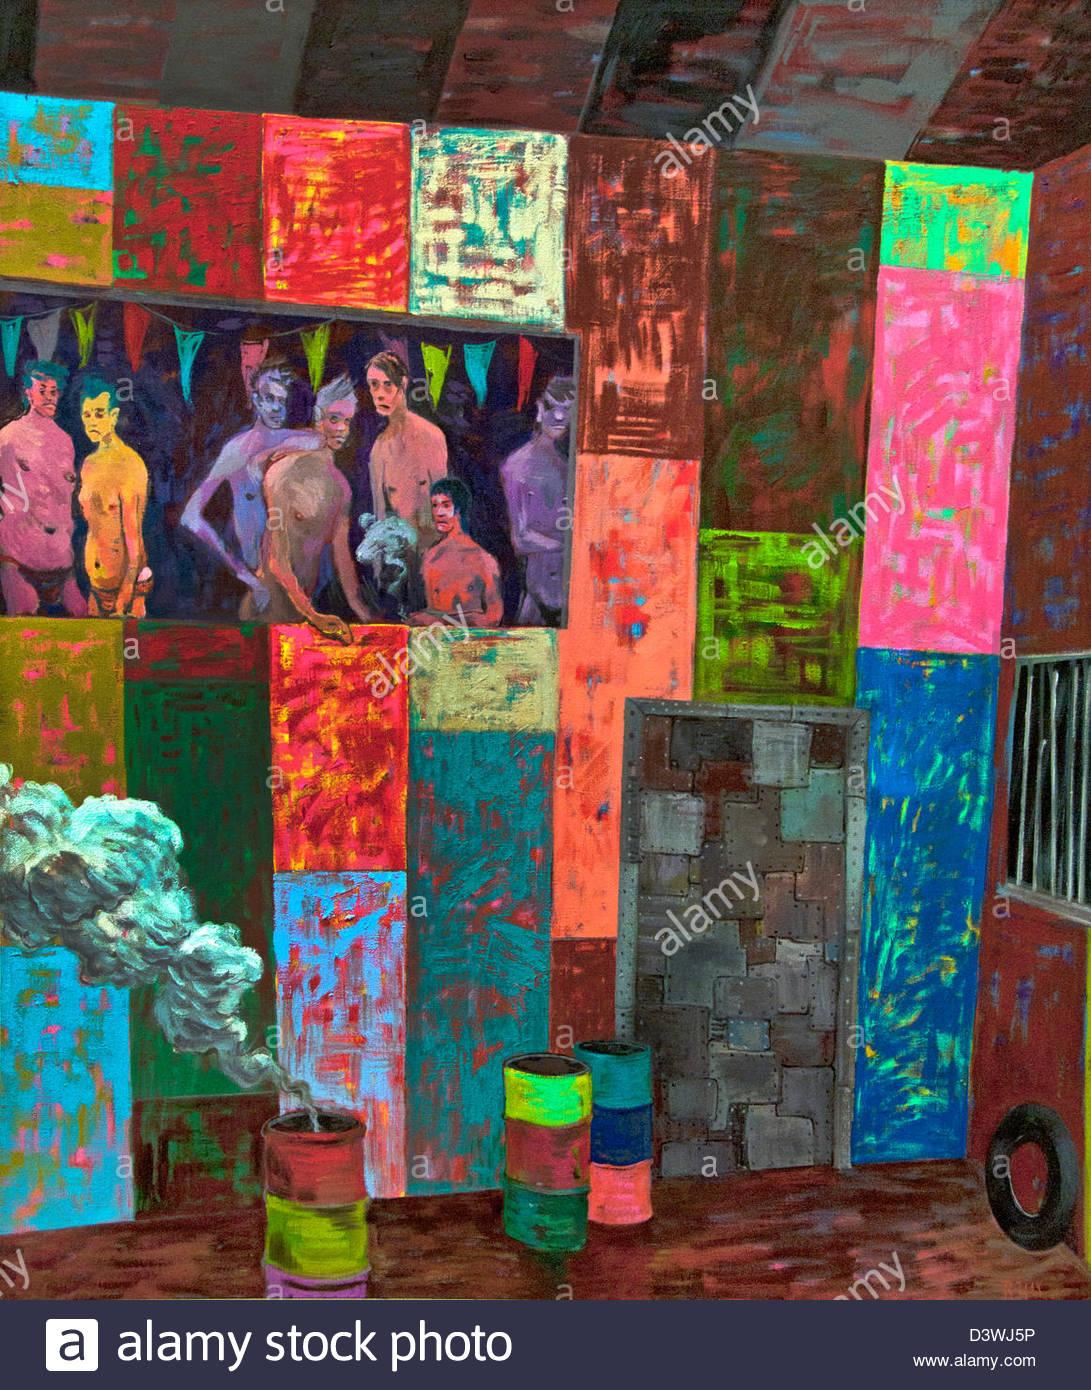 Salome Showroom 2011 Richard Hawkins amerikanische Malerei Stockbild